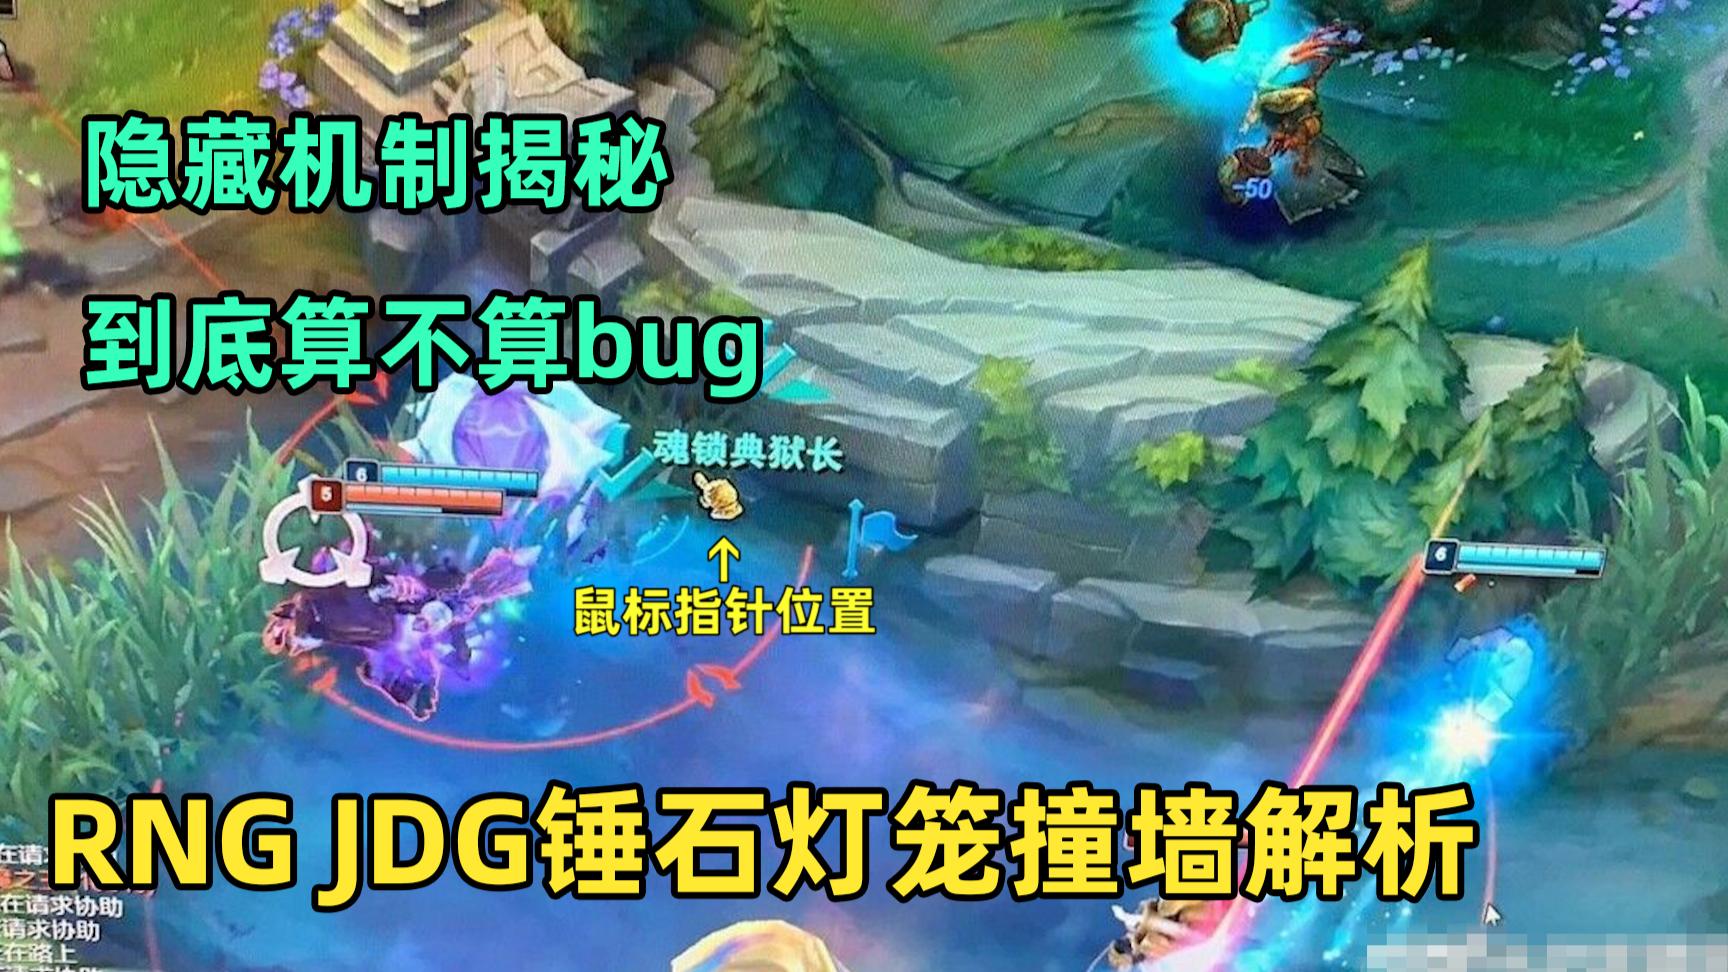 RNGvsJDG锤石灯笼卡墙揭秘:官方的判定有没有问题,到底是不是bug?